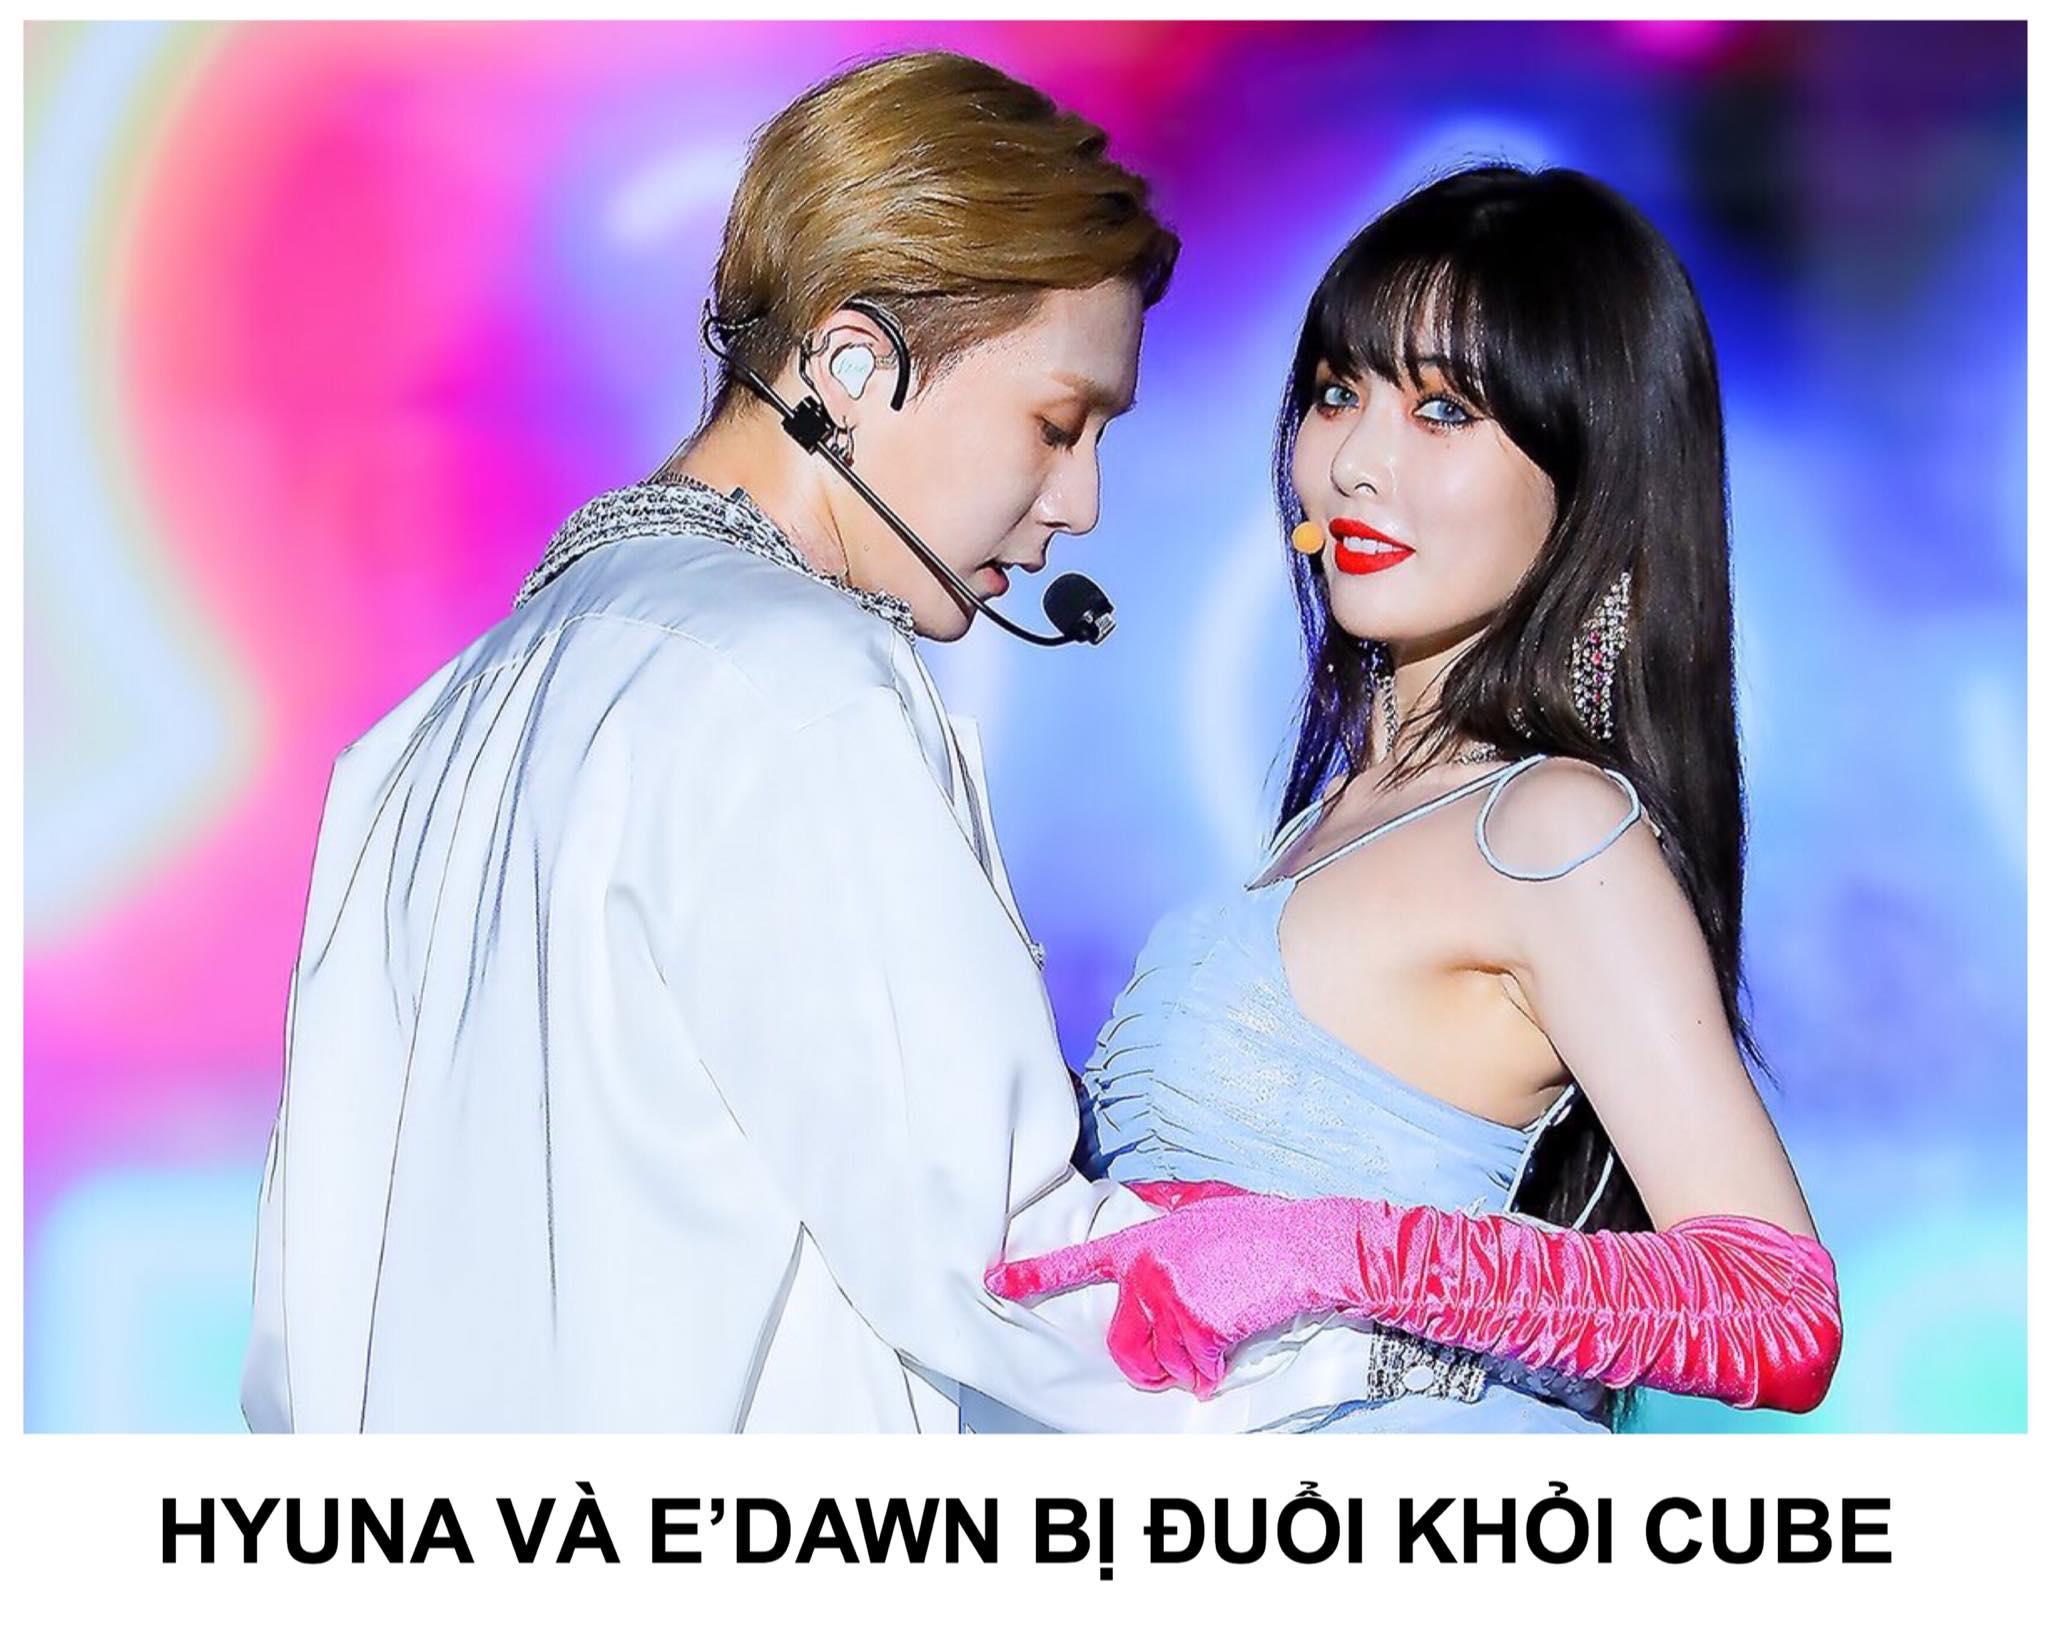 nu-hoang-sexy-hyuna-va-ban-trai-bi-cube-buoc-roi-cong-ty-1